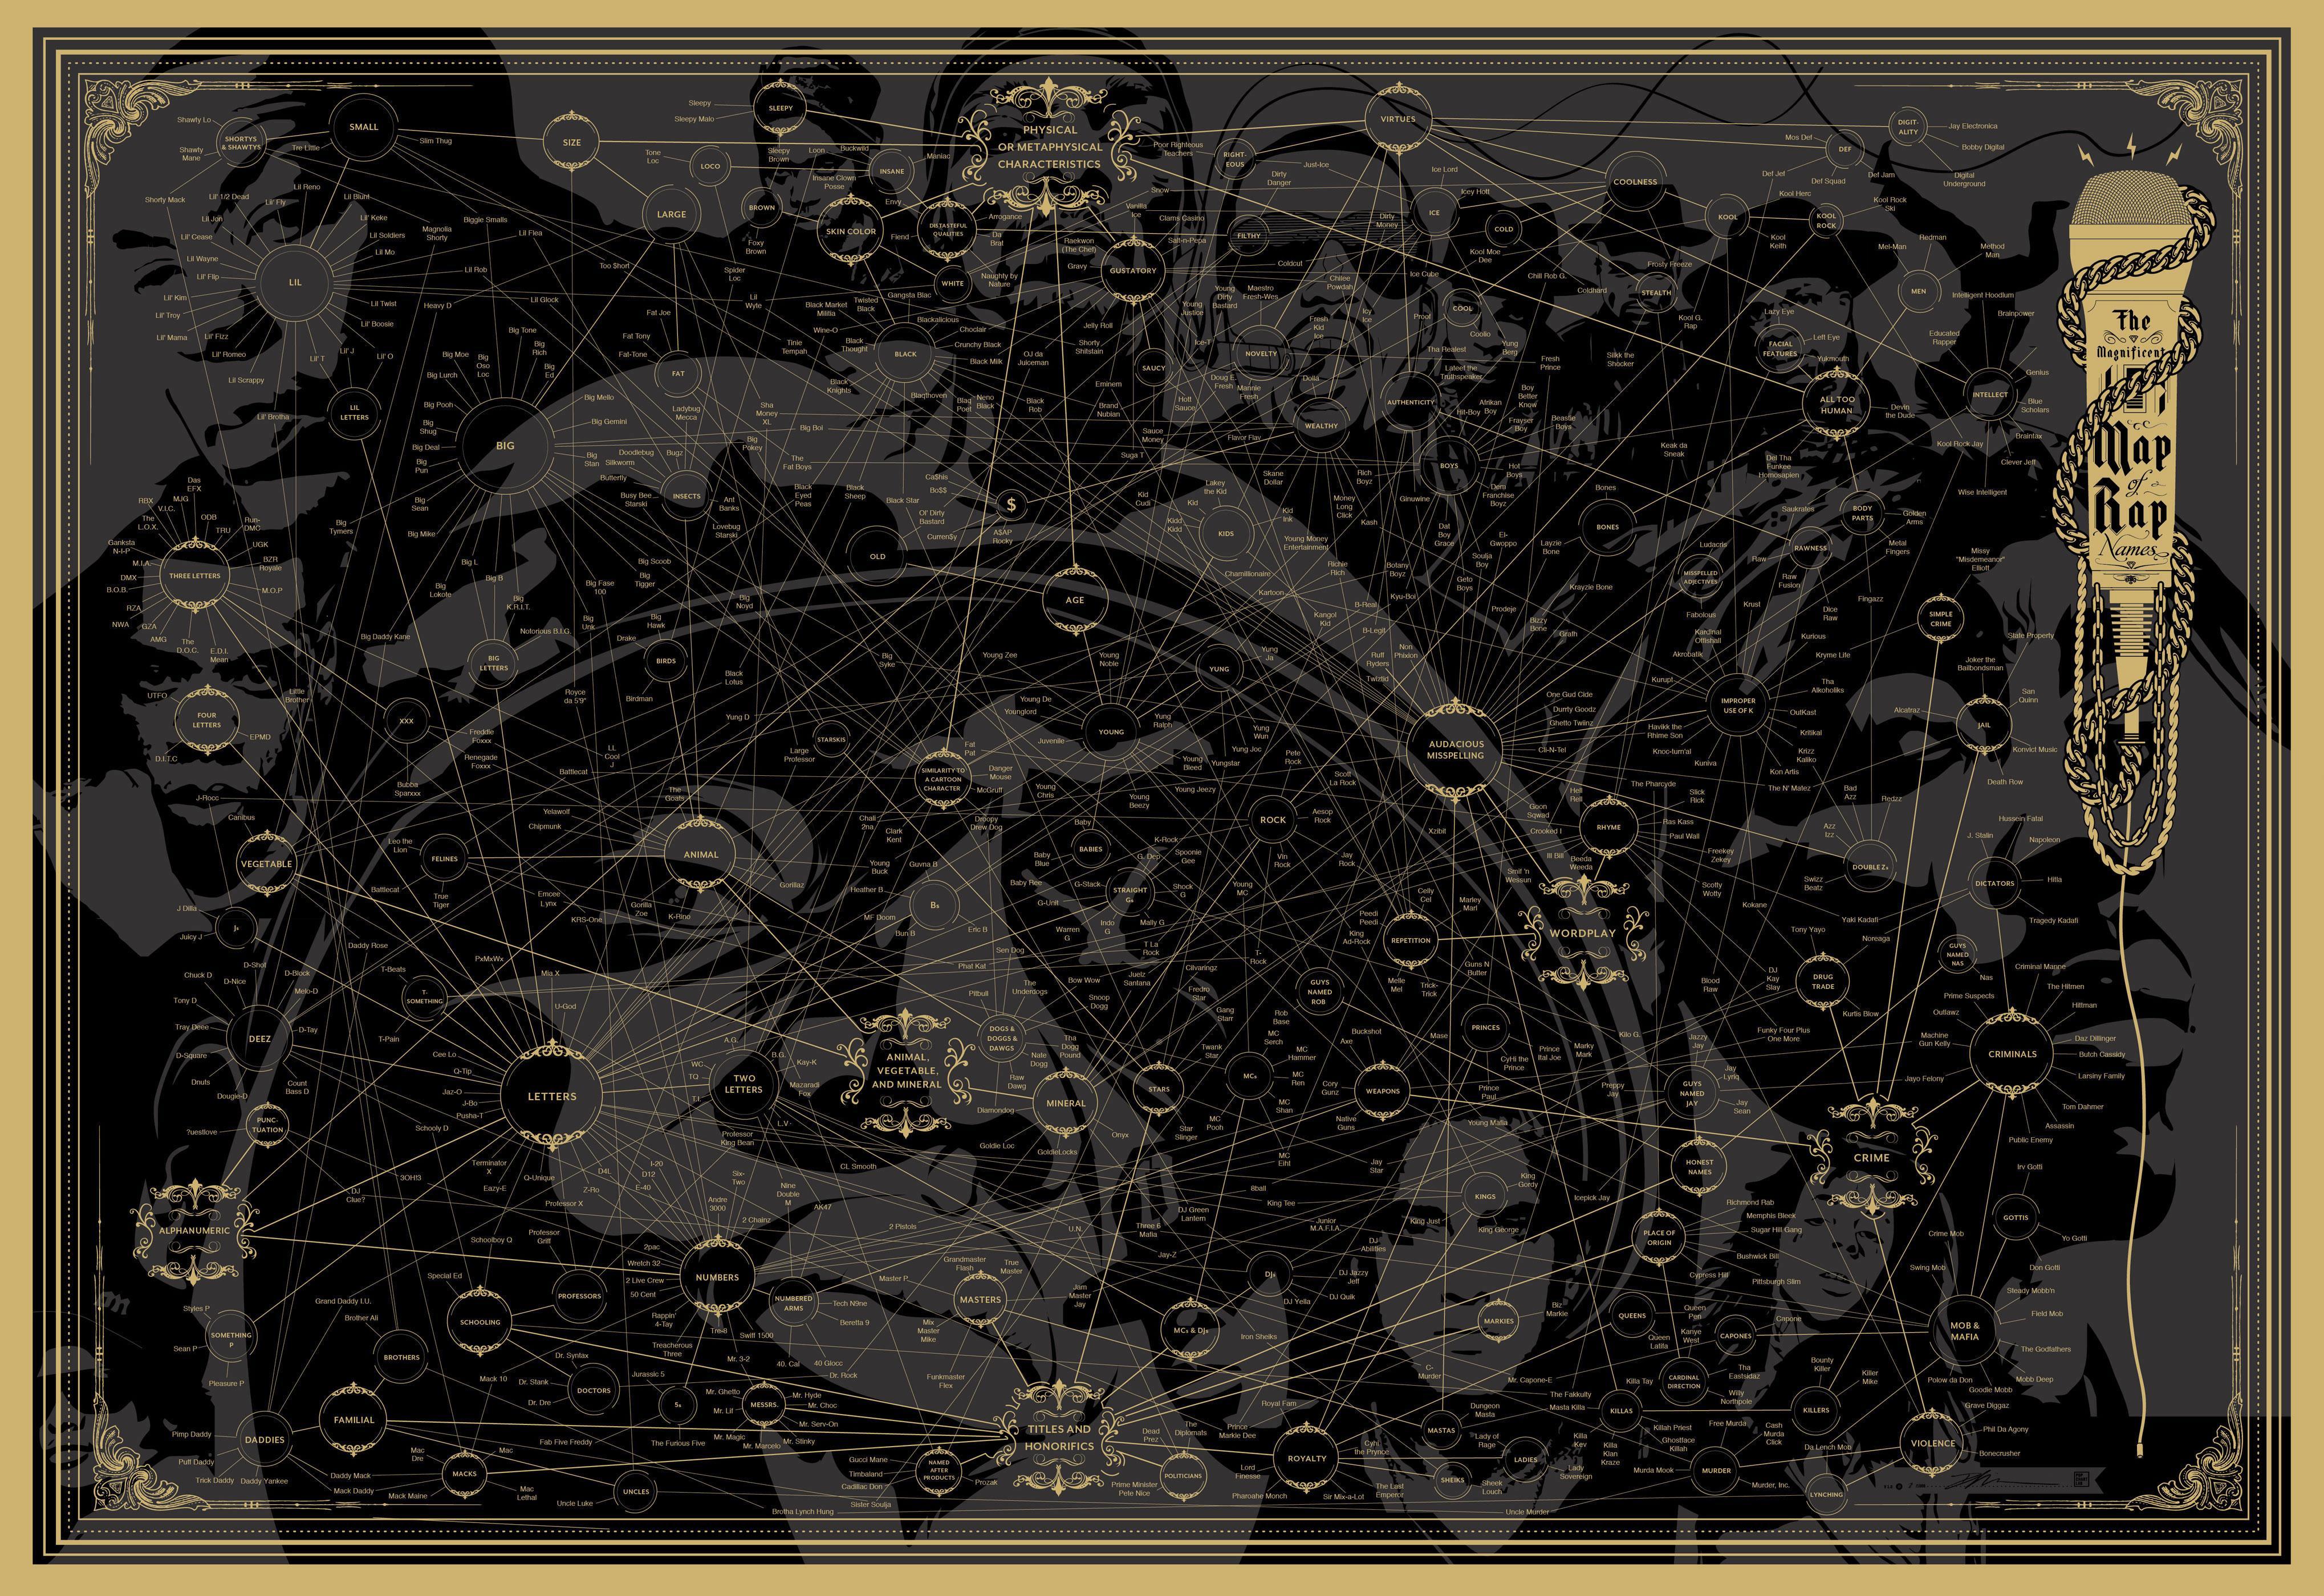 PopChartLab_RapMap_Large221.jpg (JPEG Image, 4076×2800 pixels)